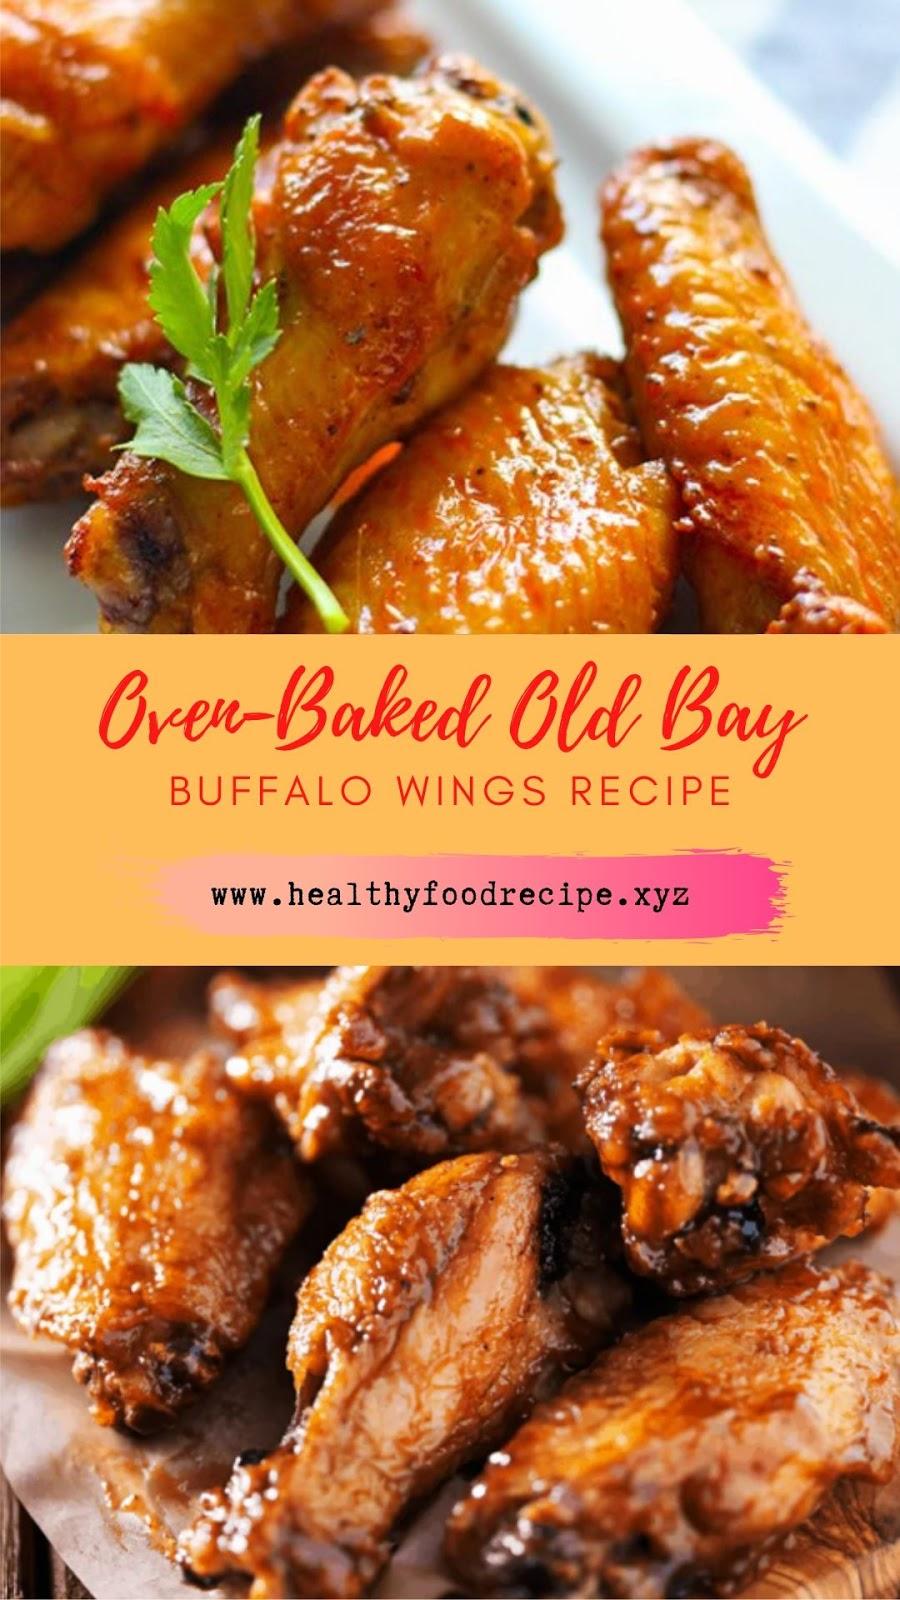 Oven-Baked Old Bay Buffalo Wings Recipe